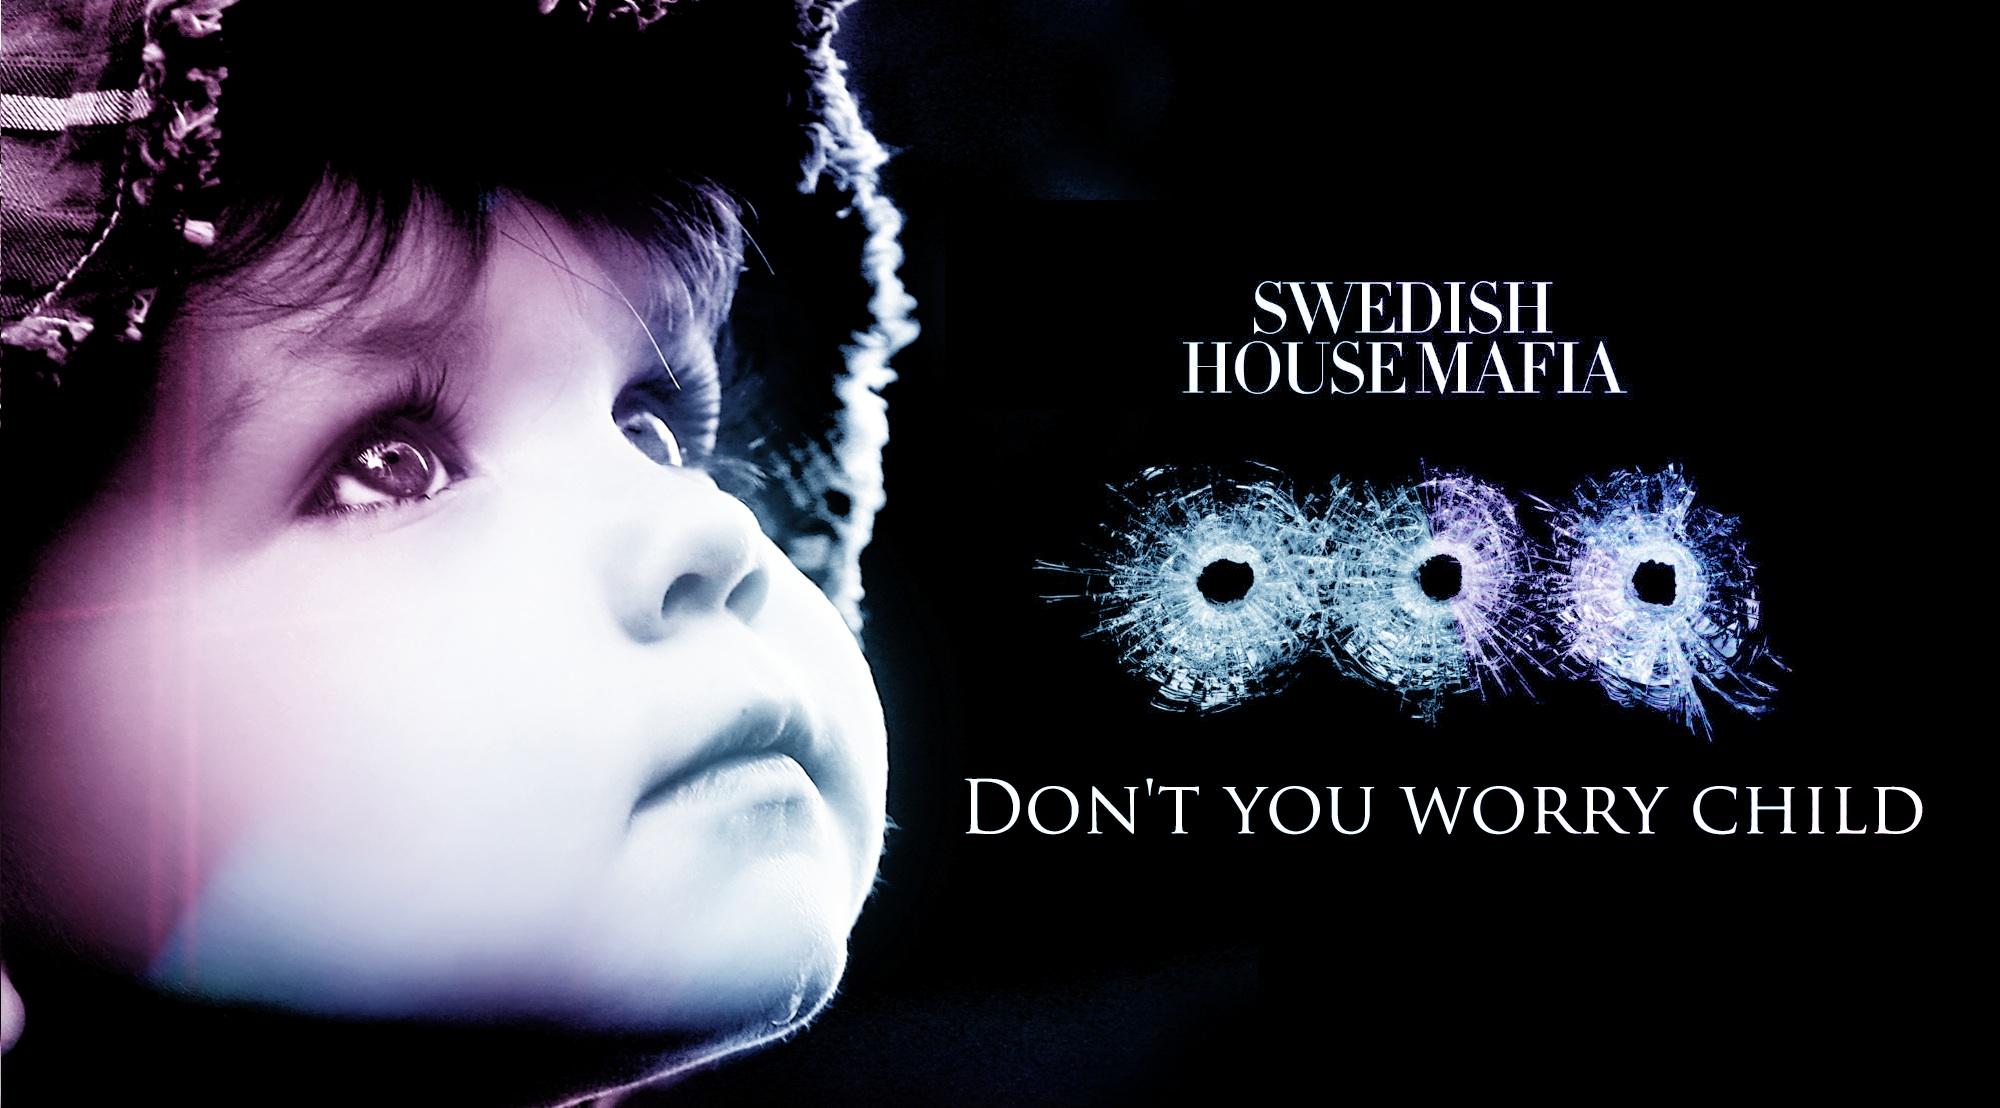 Don't You Worry Child Swedish House Mafia